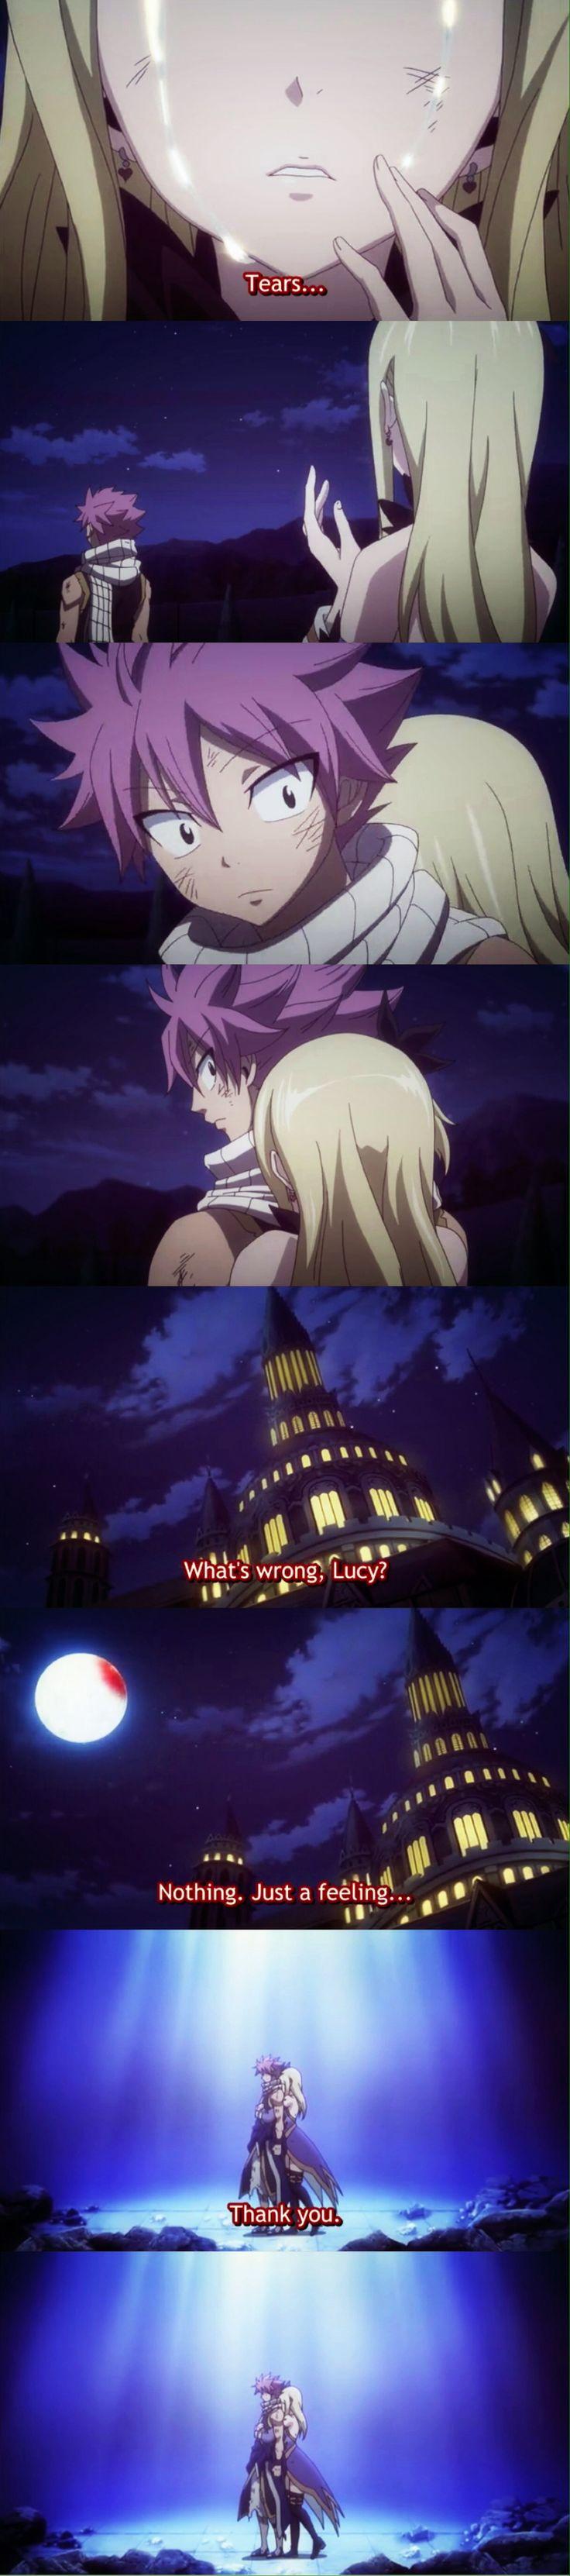 NaLu: fairy tail episode 198